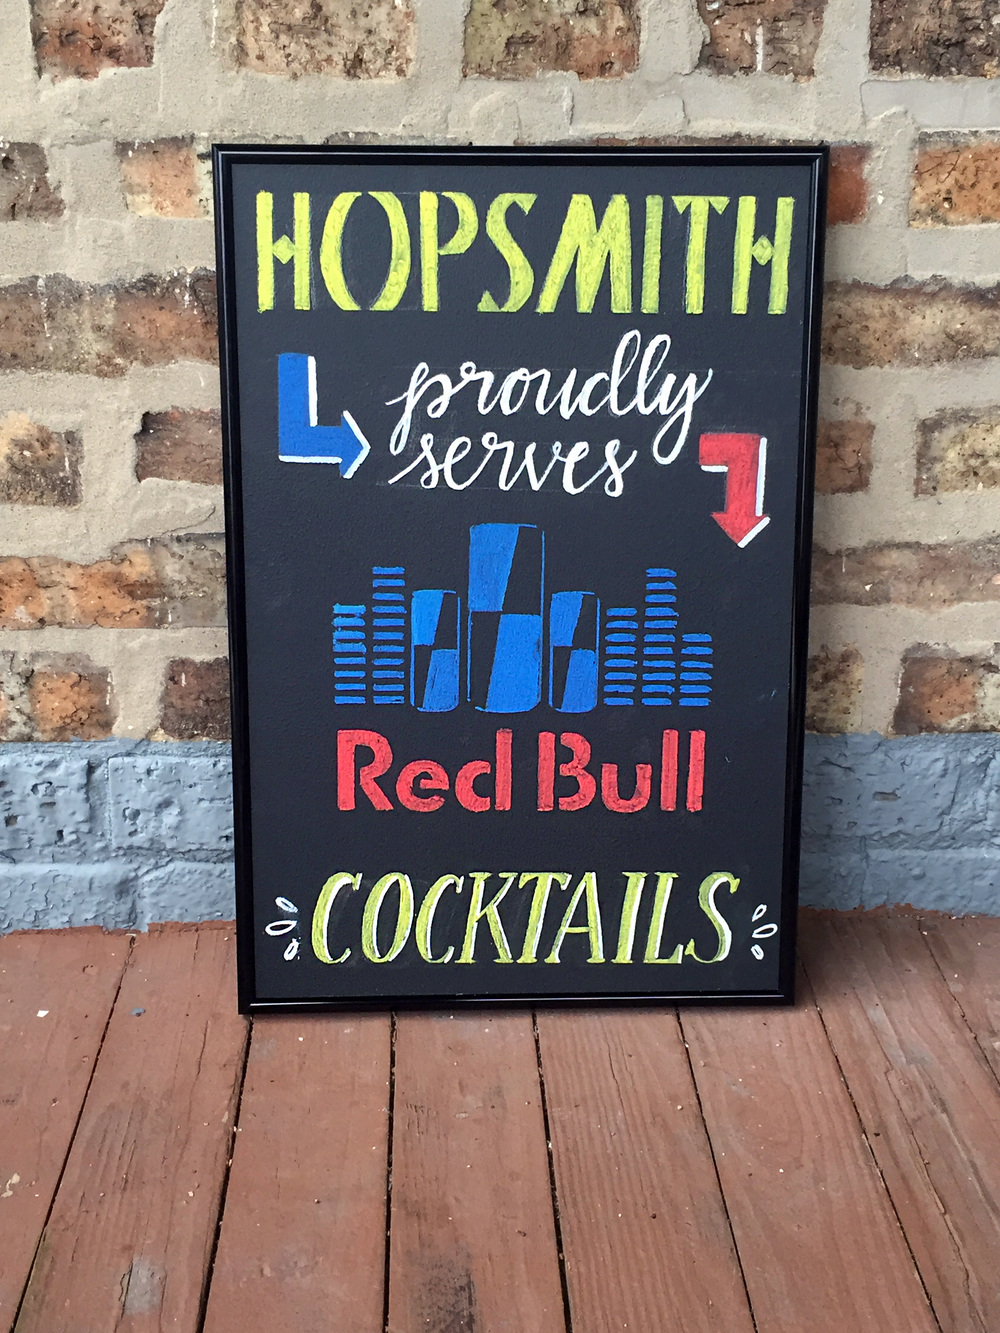 HopSmith.jpg